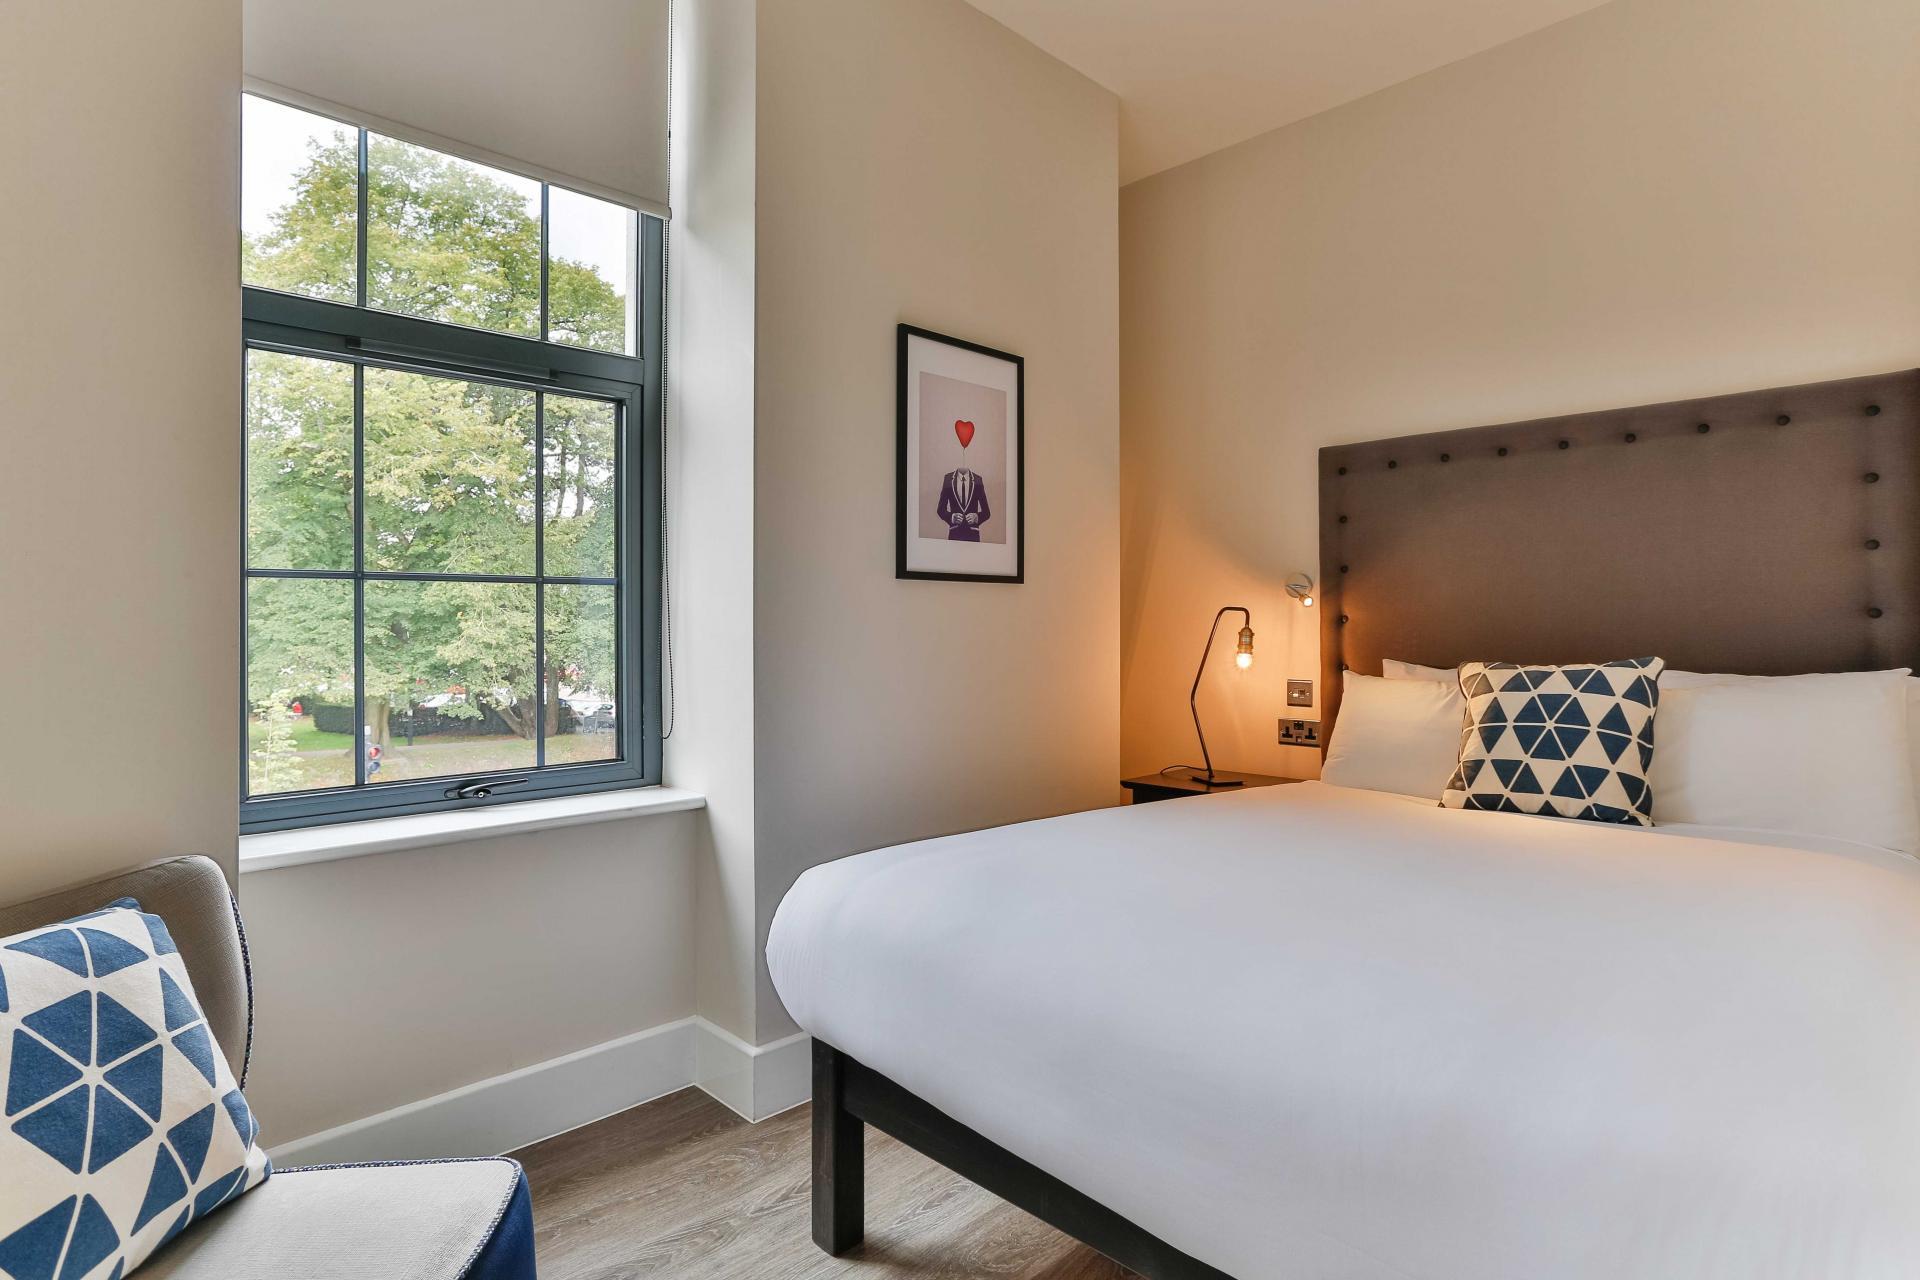 Bedroom at Park Lane Aparthotel, Centre, Cardiff - Citybase Apartments